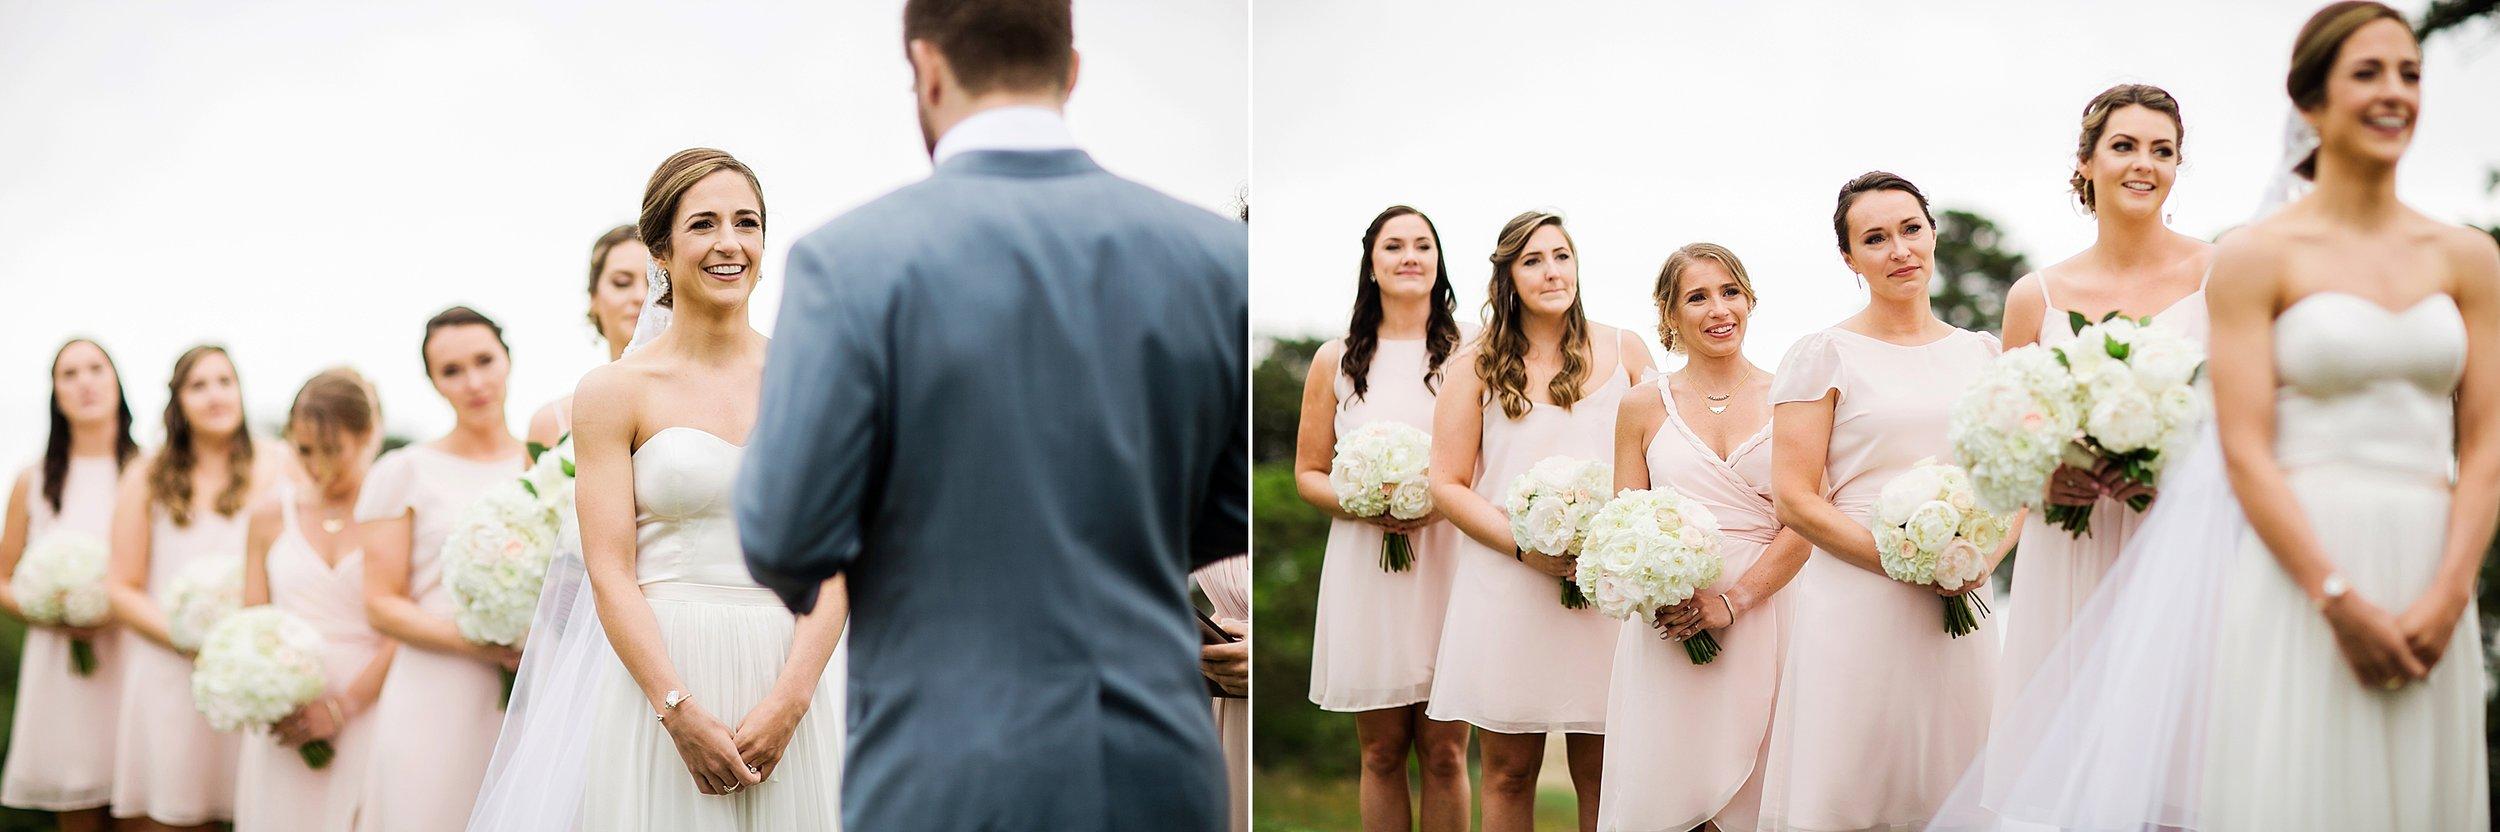 035 los angeles wedding photographer todd danforth photography cape cod.jpg